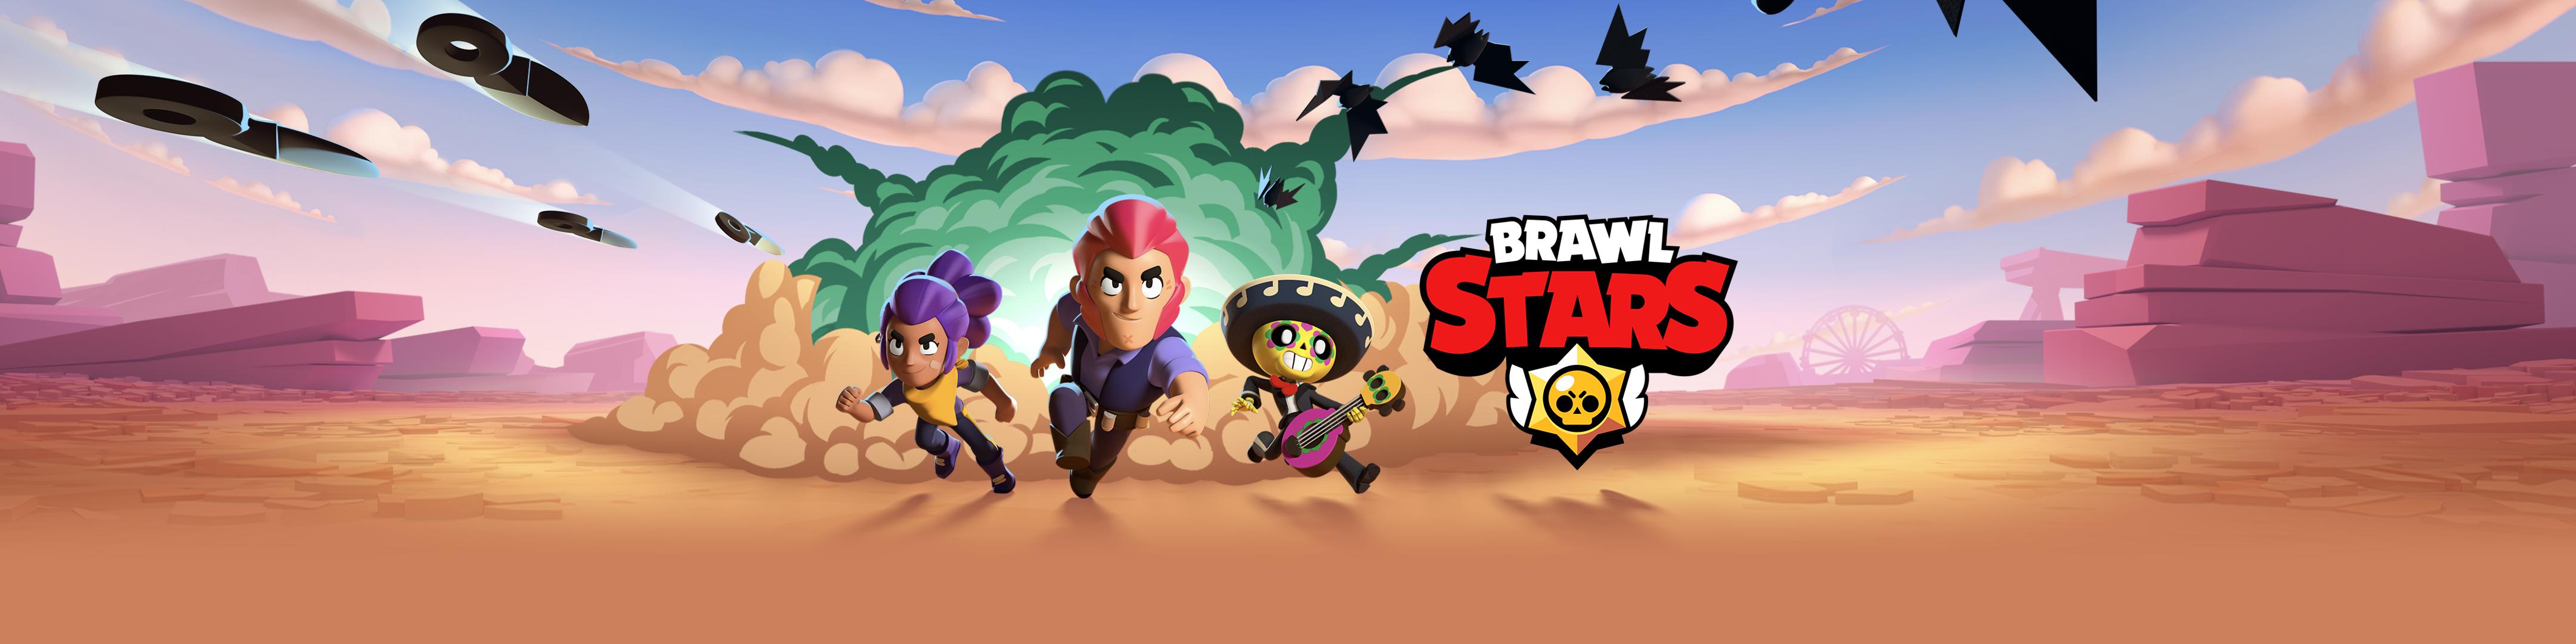 Brawl Stars - Revenue & Download estimates - Apple App Store - US